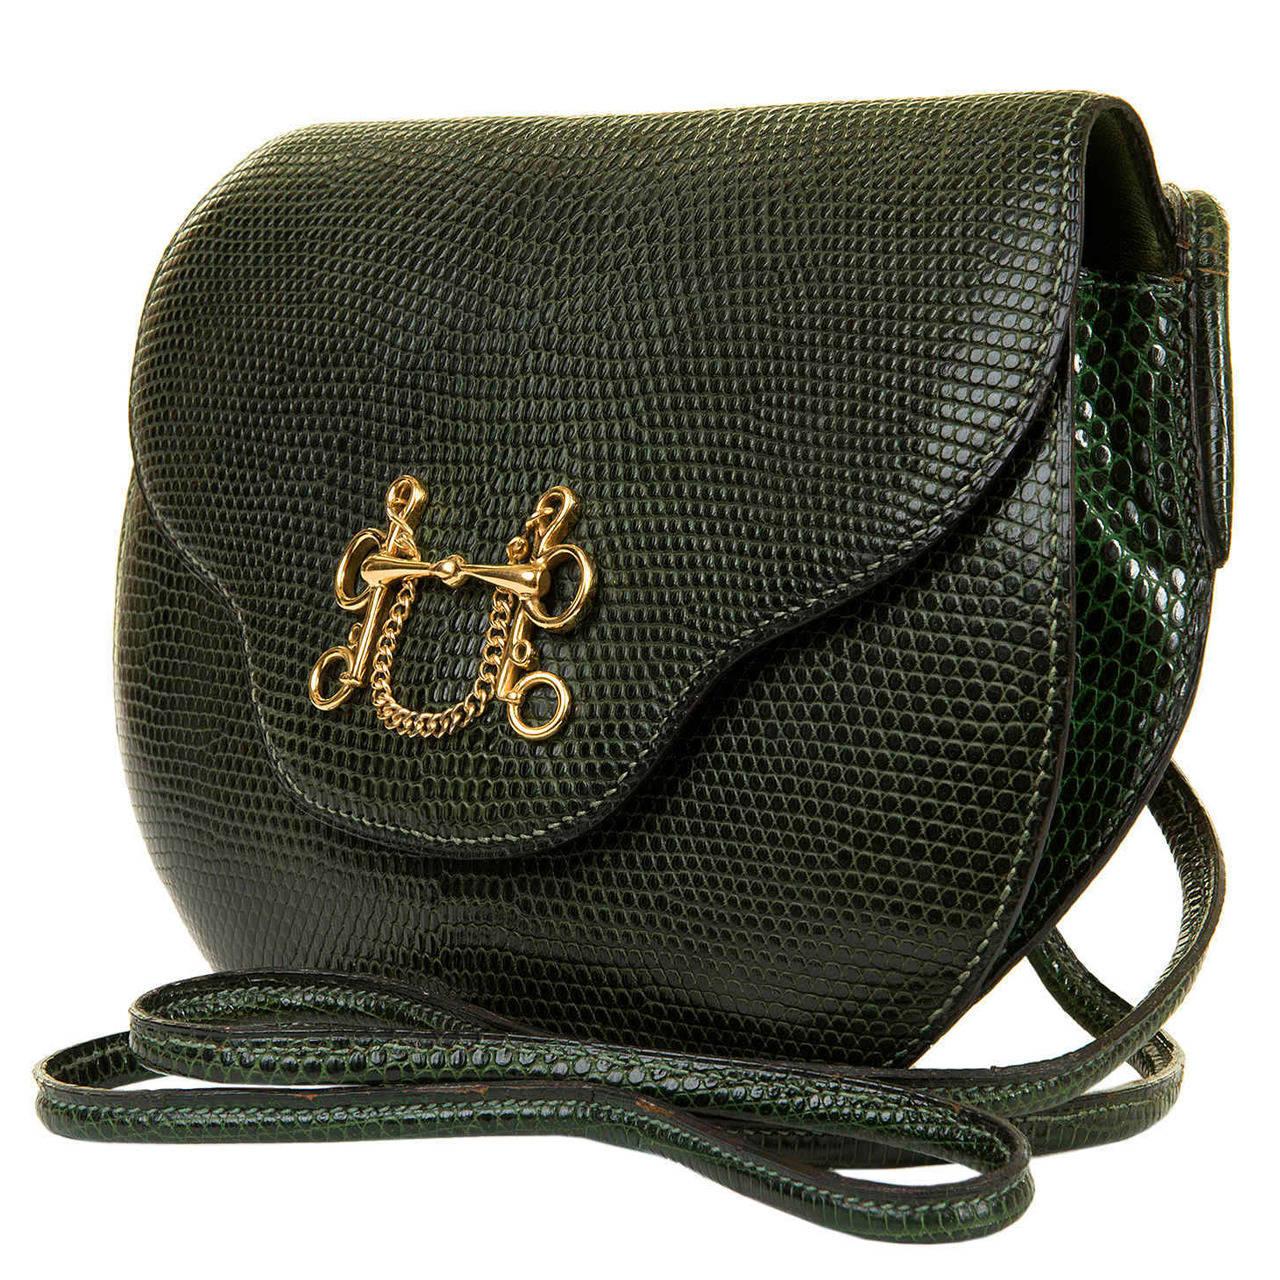 Rare & Important Hermes Green Lizard & 'Bronze Dore' Cross Body Bag ...